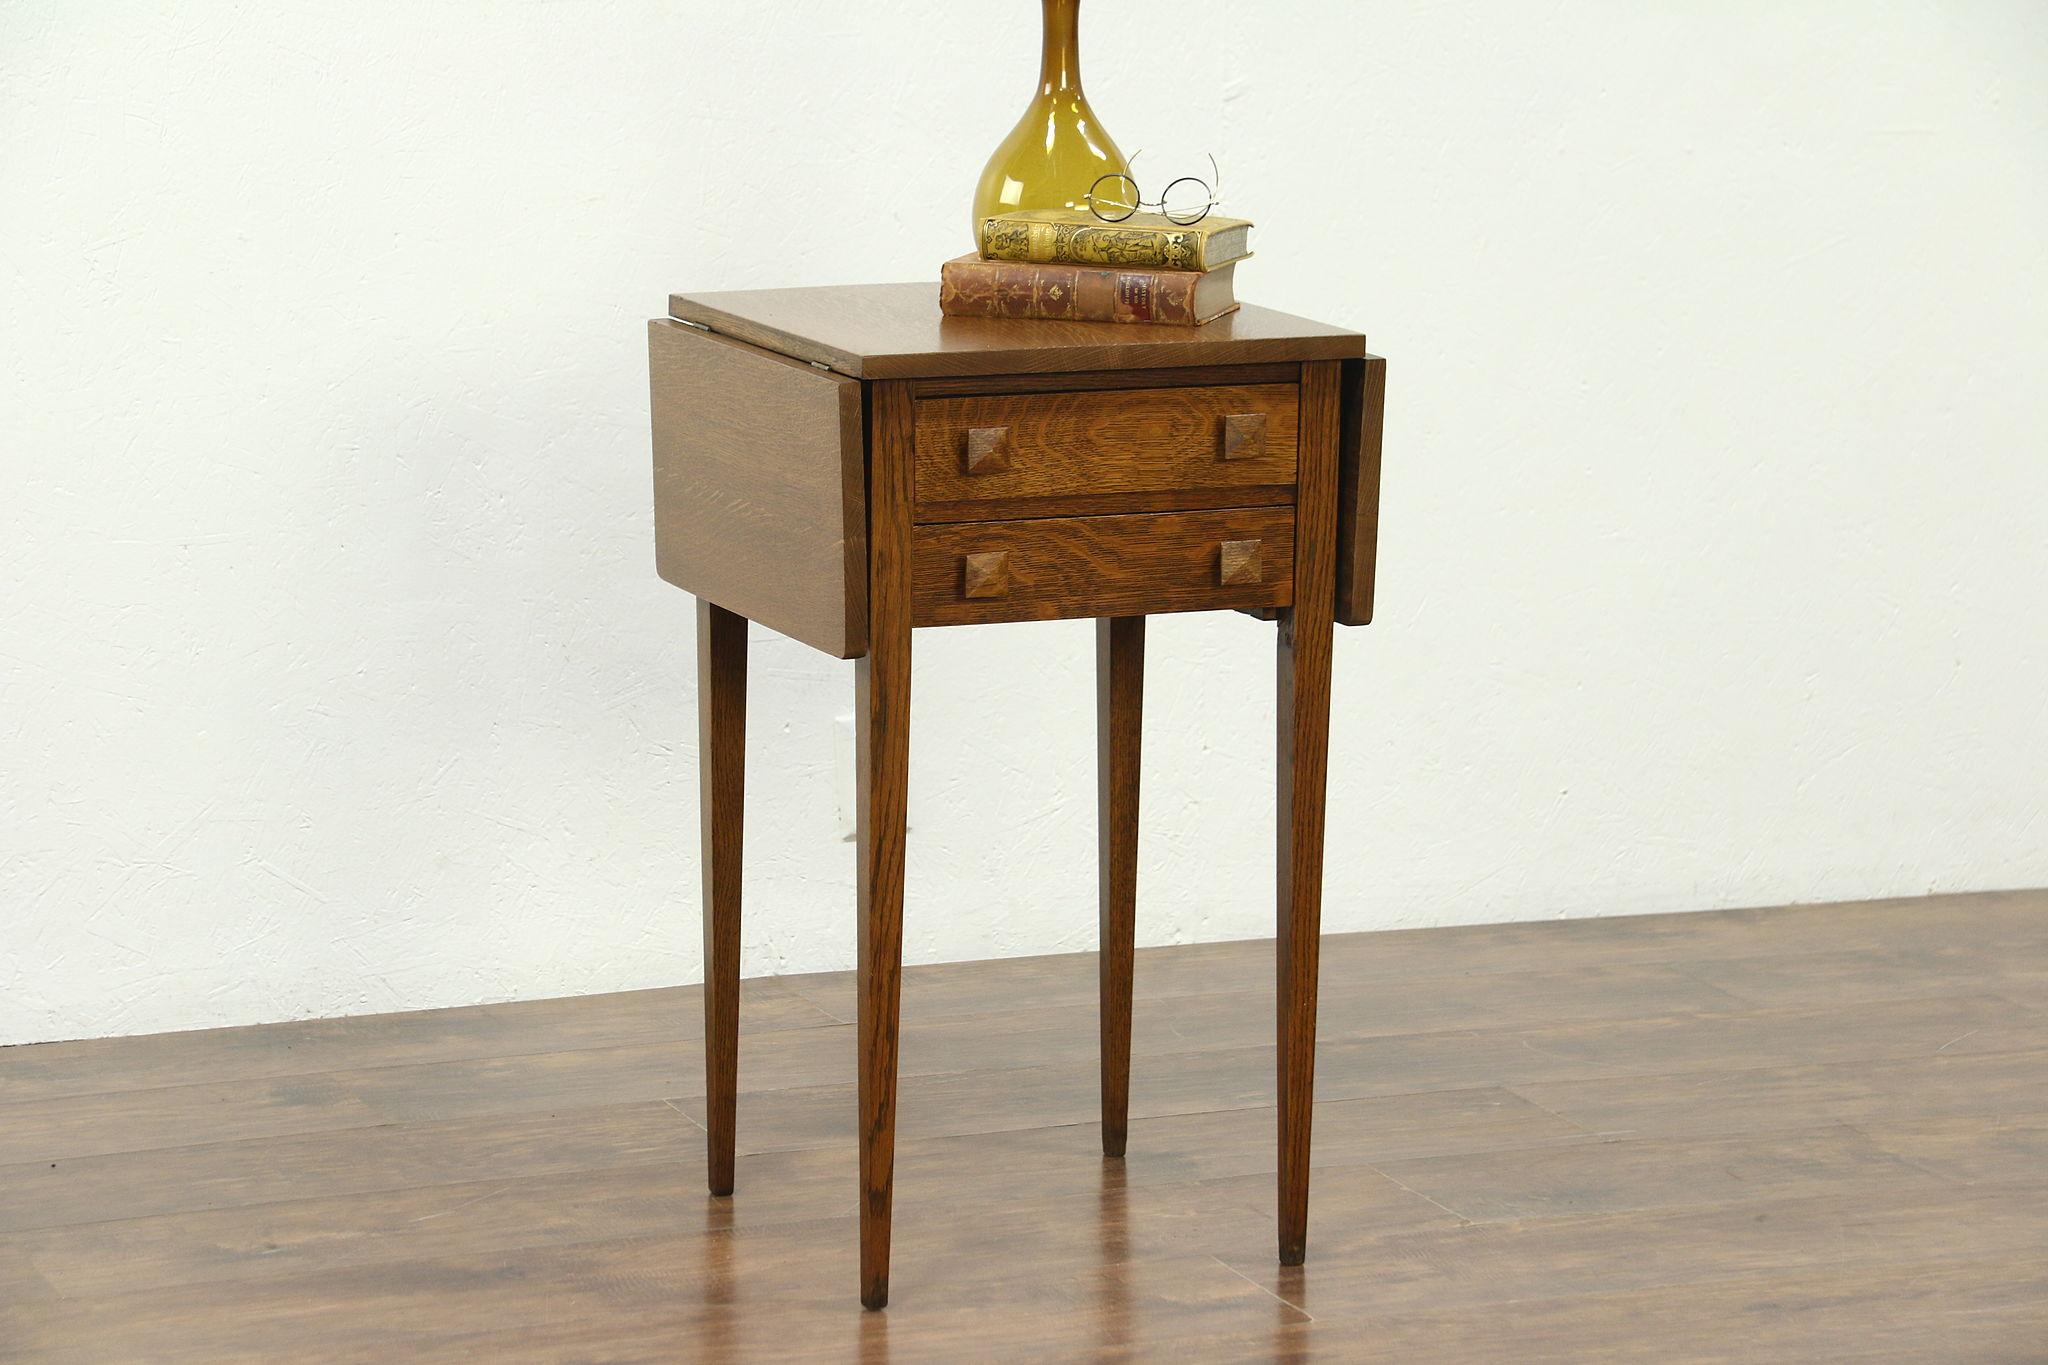 Arts Crafts Mission Oak Antique Craftsman Dropleaf Table Nightstand